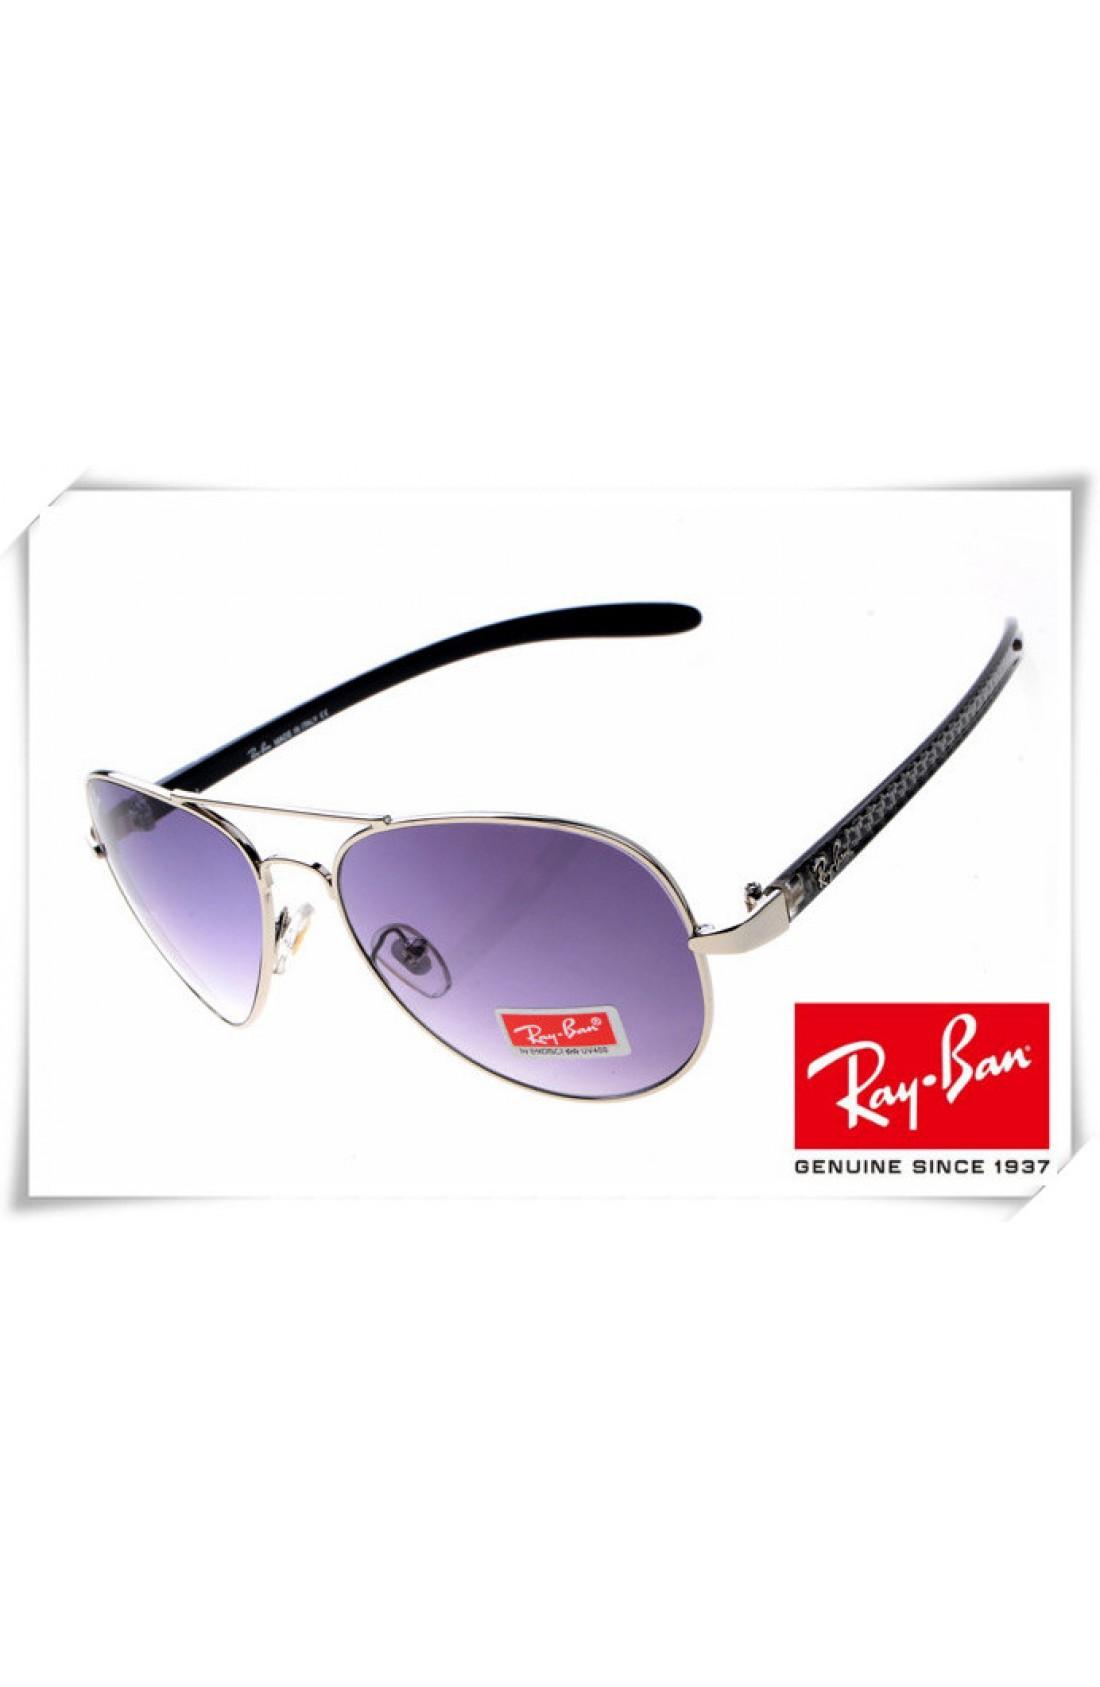 Cheap Ray Ban RB8307 Tech Sunglasses Carbon Fibre Black